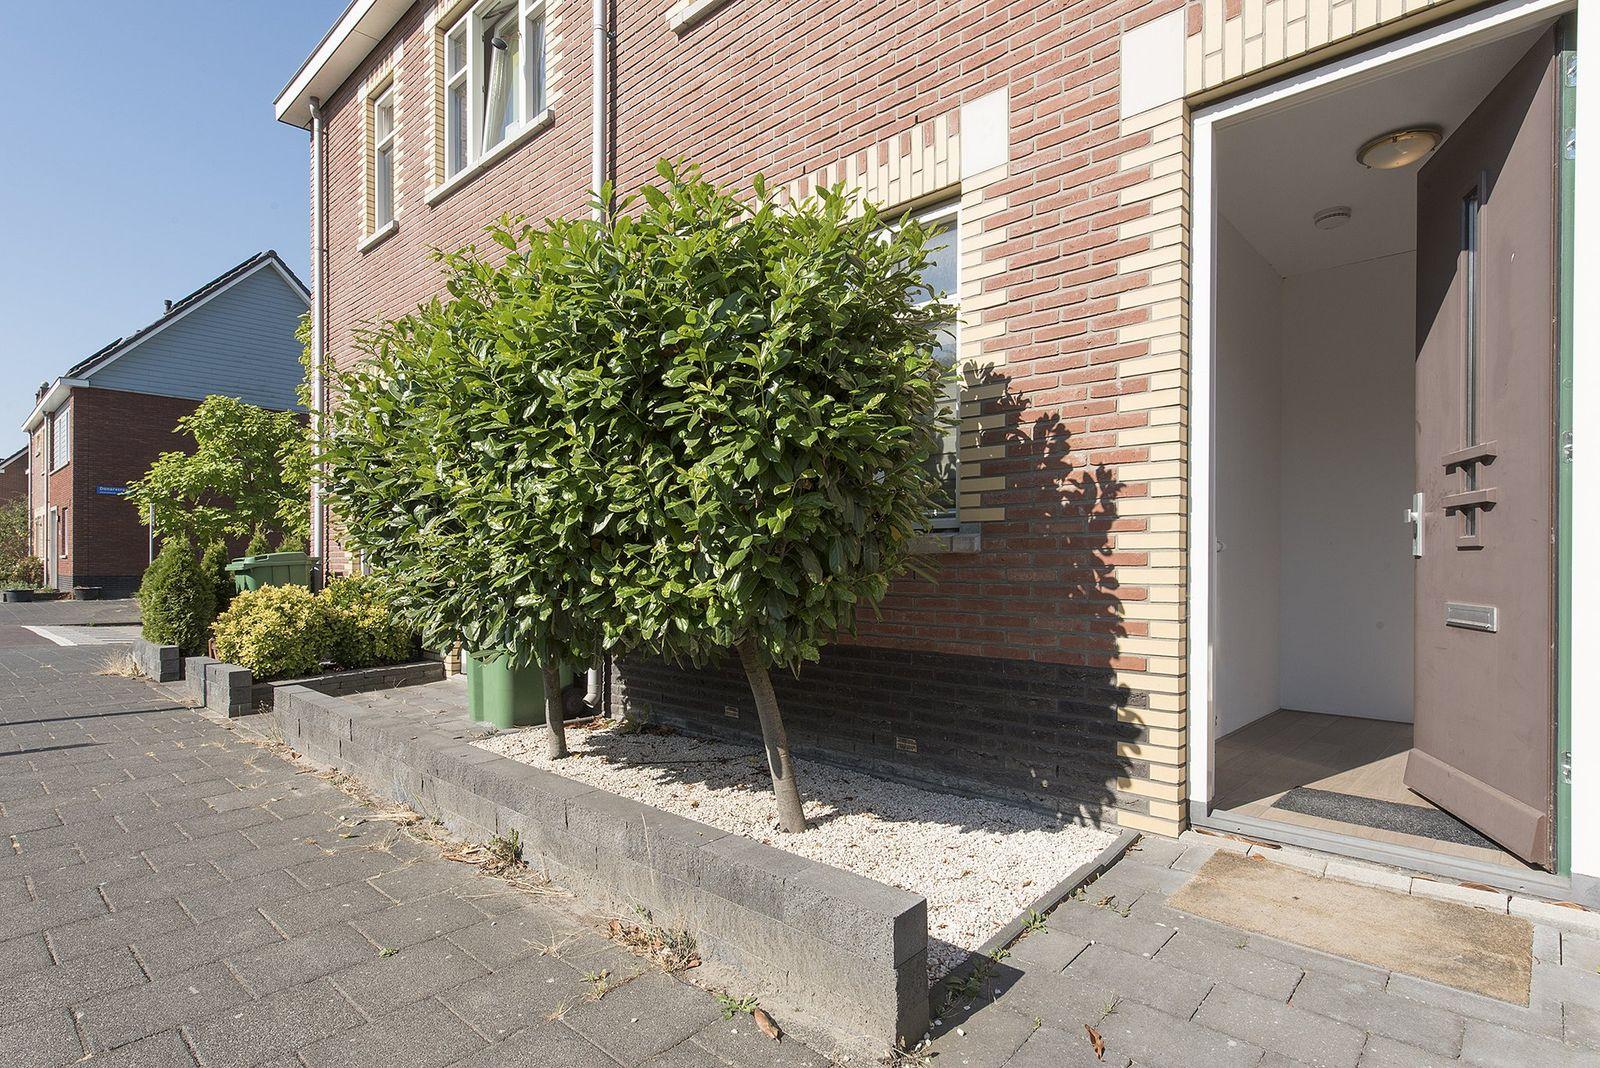 Achillesstraat 48, Almere